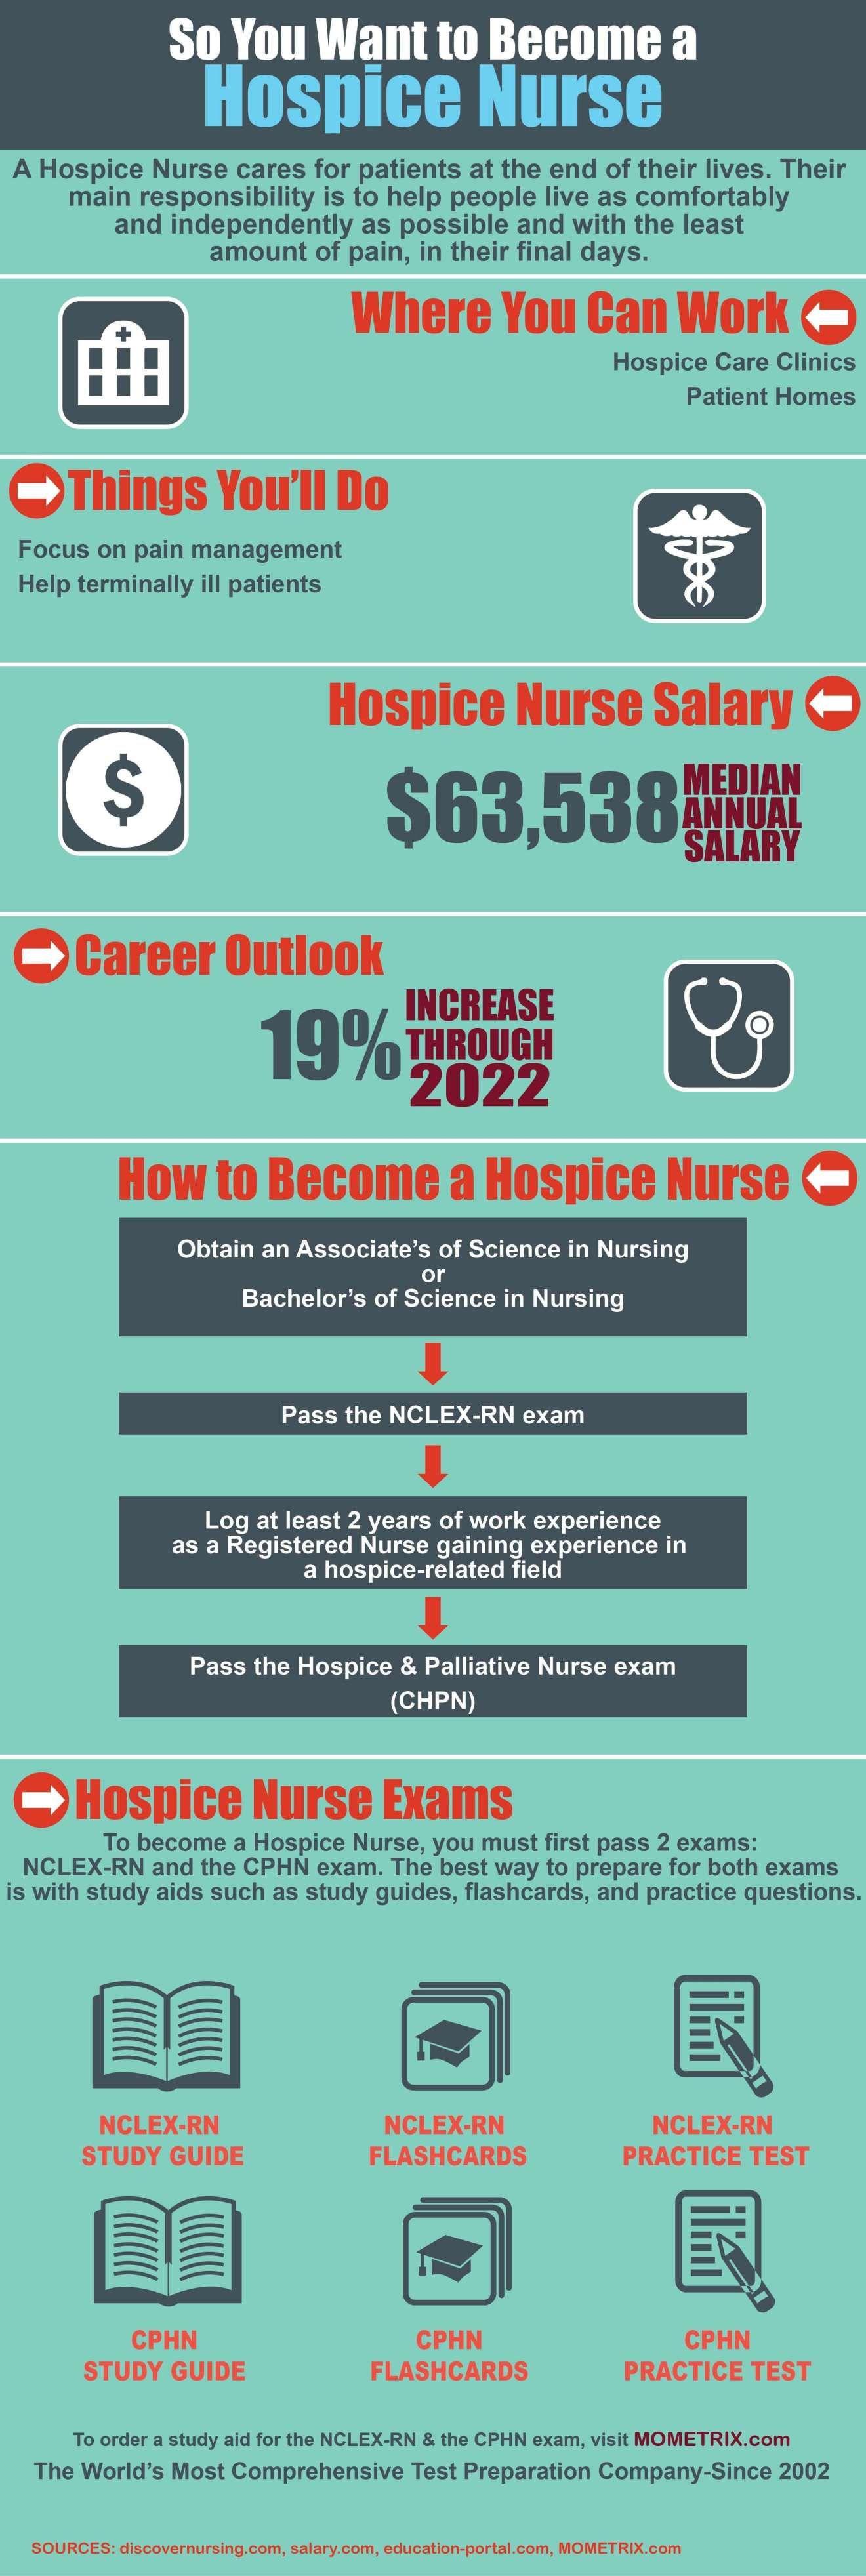 nurse hospice nursing mometrix become want test tips documents anesthesia